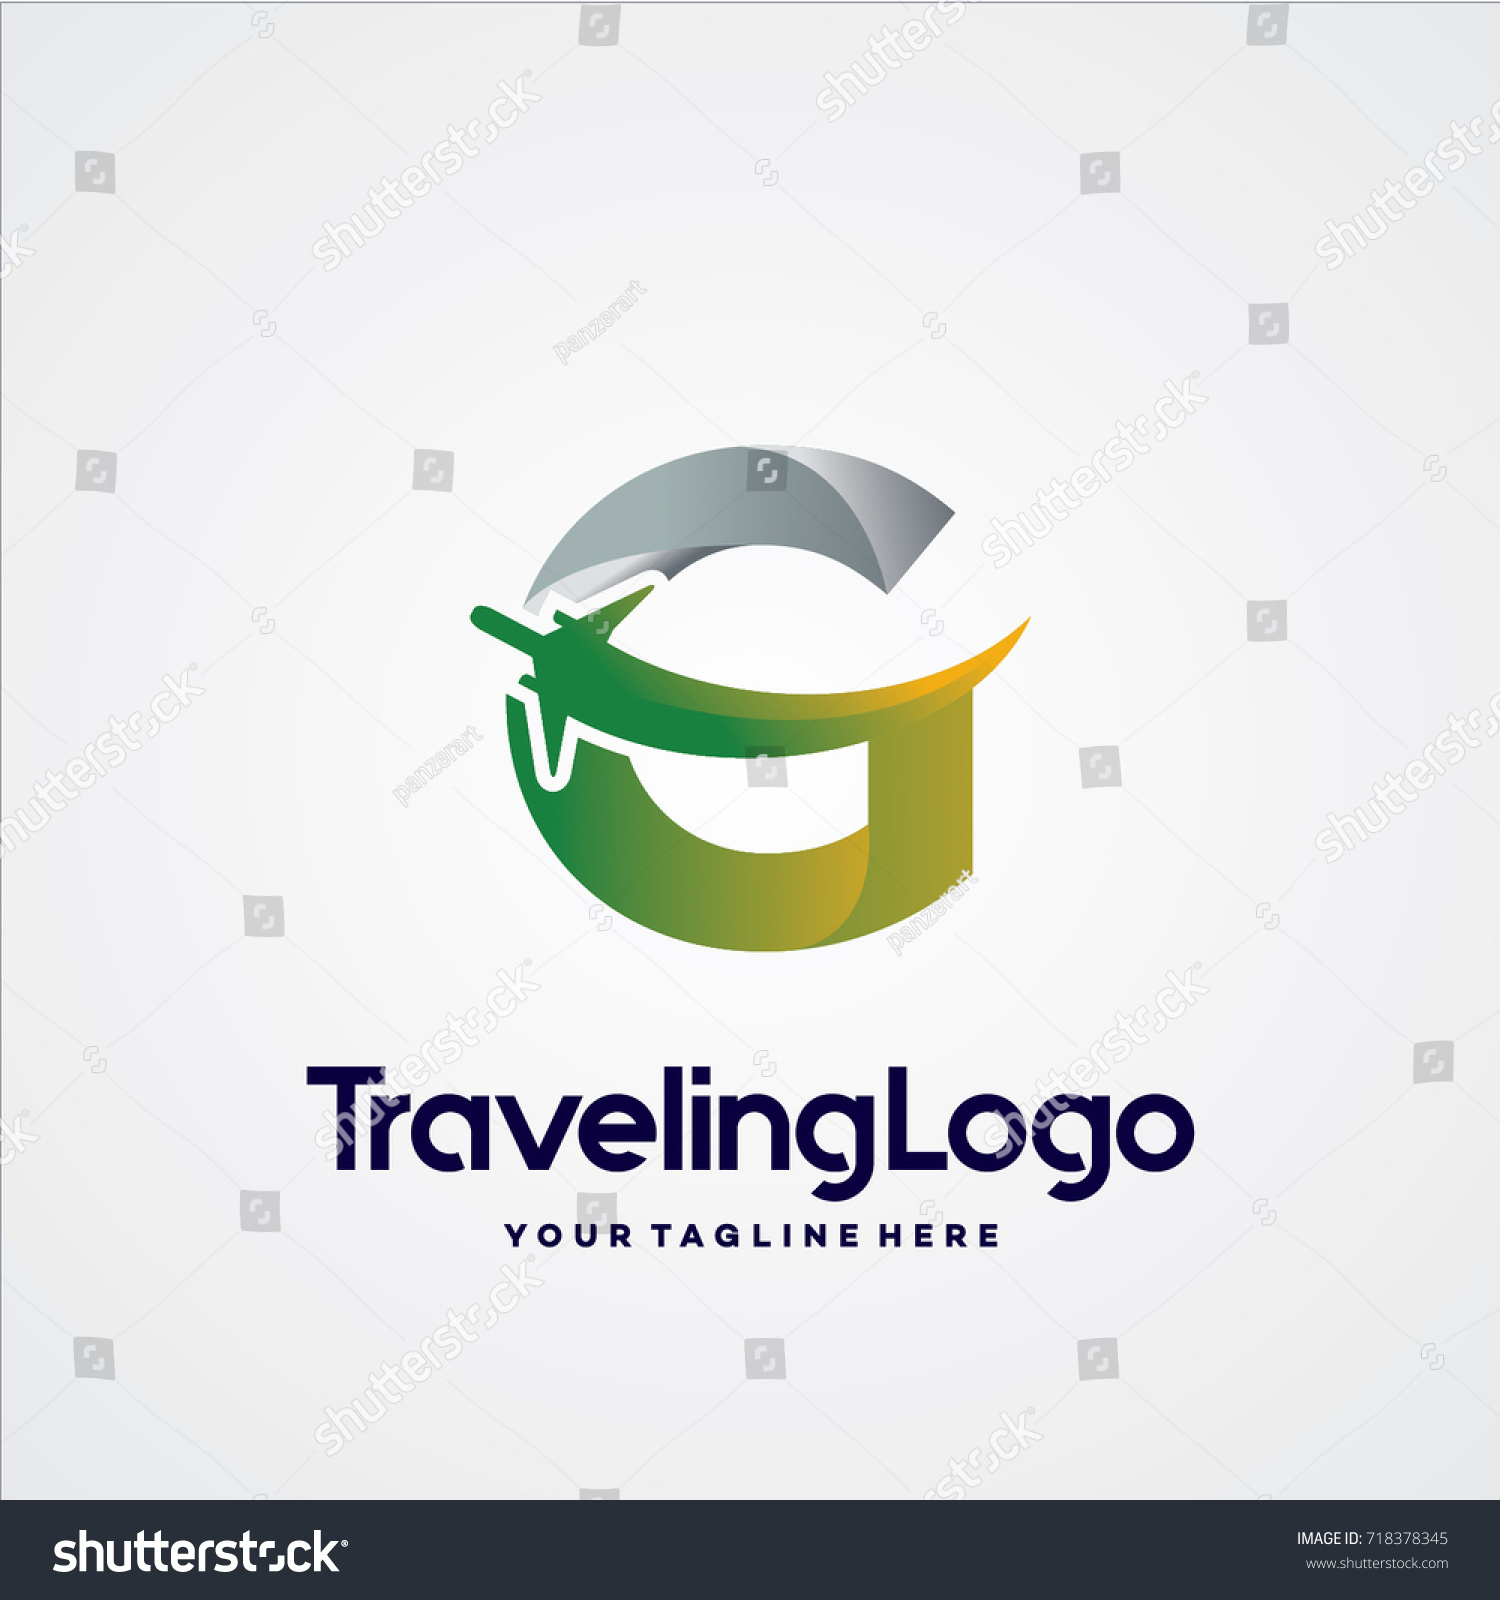 Letter g travel logo template design stock vector royalty free letter g travel logo template design vector emblem design concept creative symbol maxwellsz